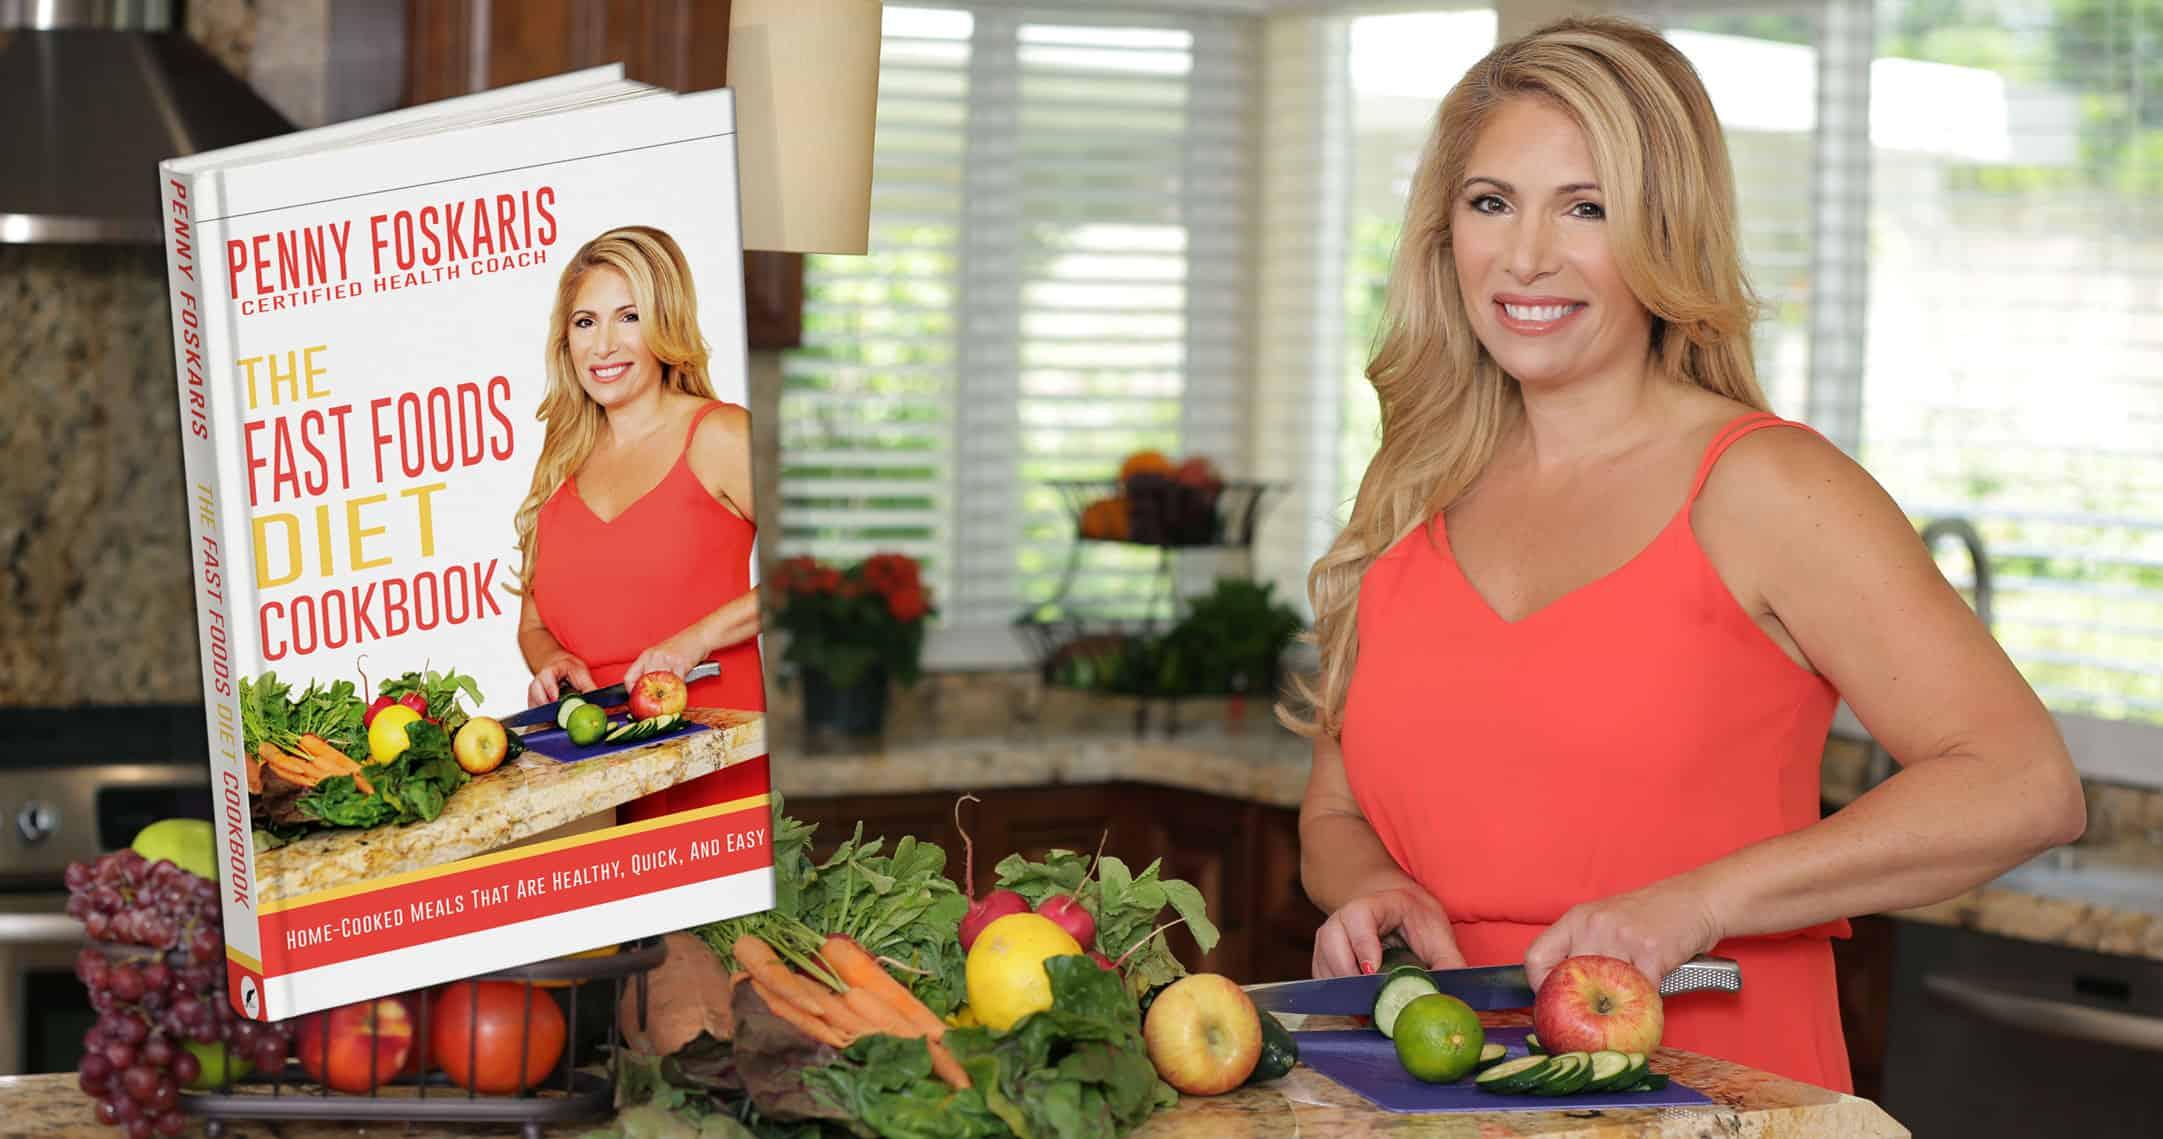 The Fast Foods Diet Cookbook